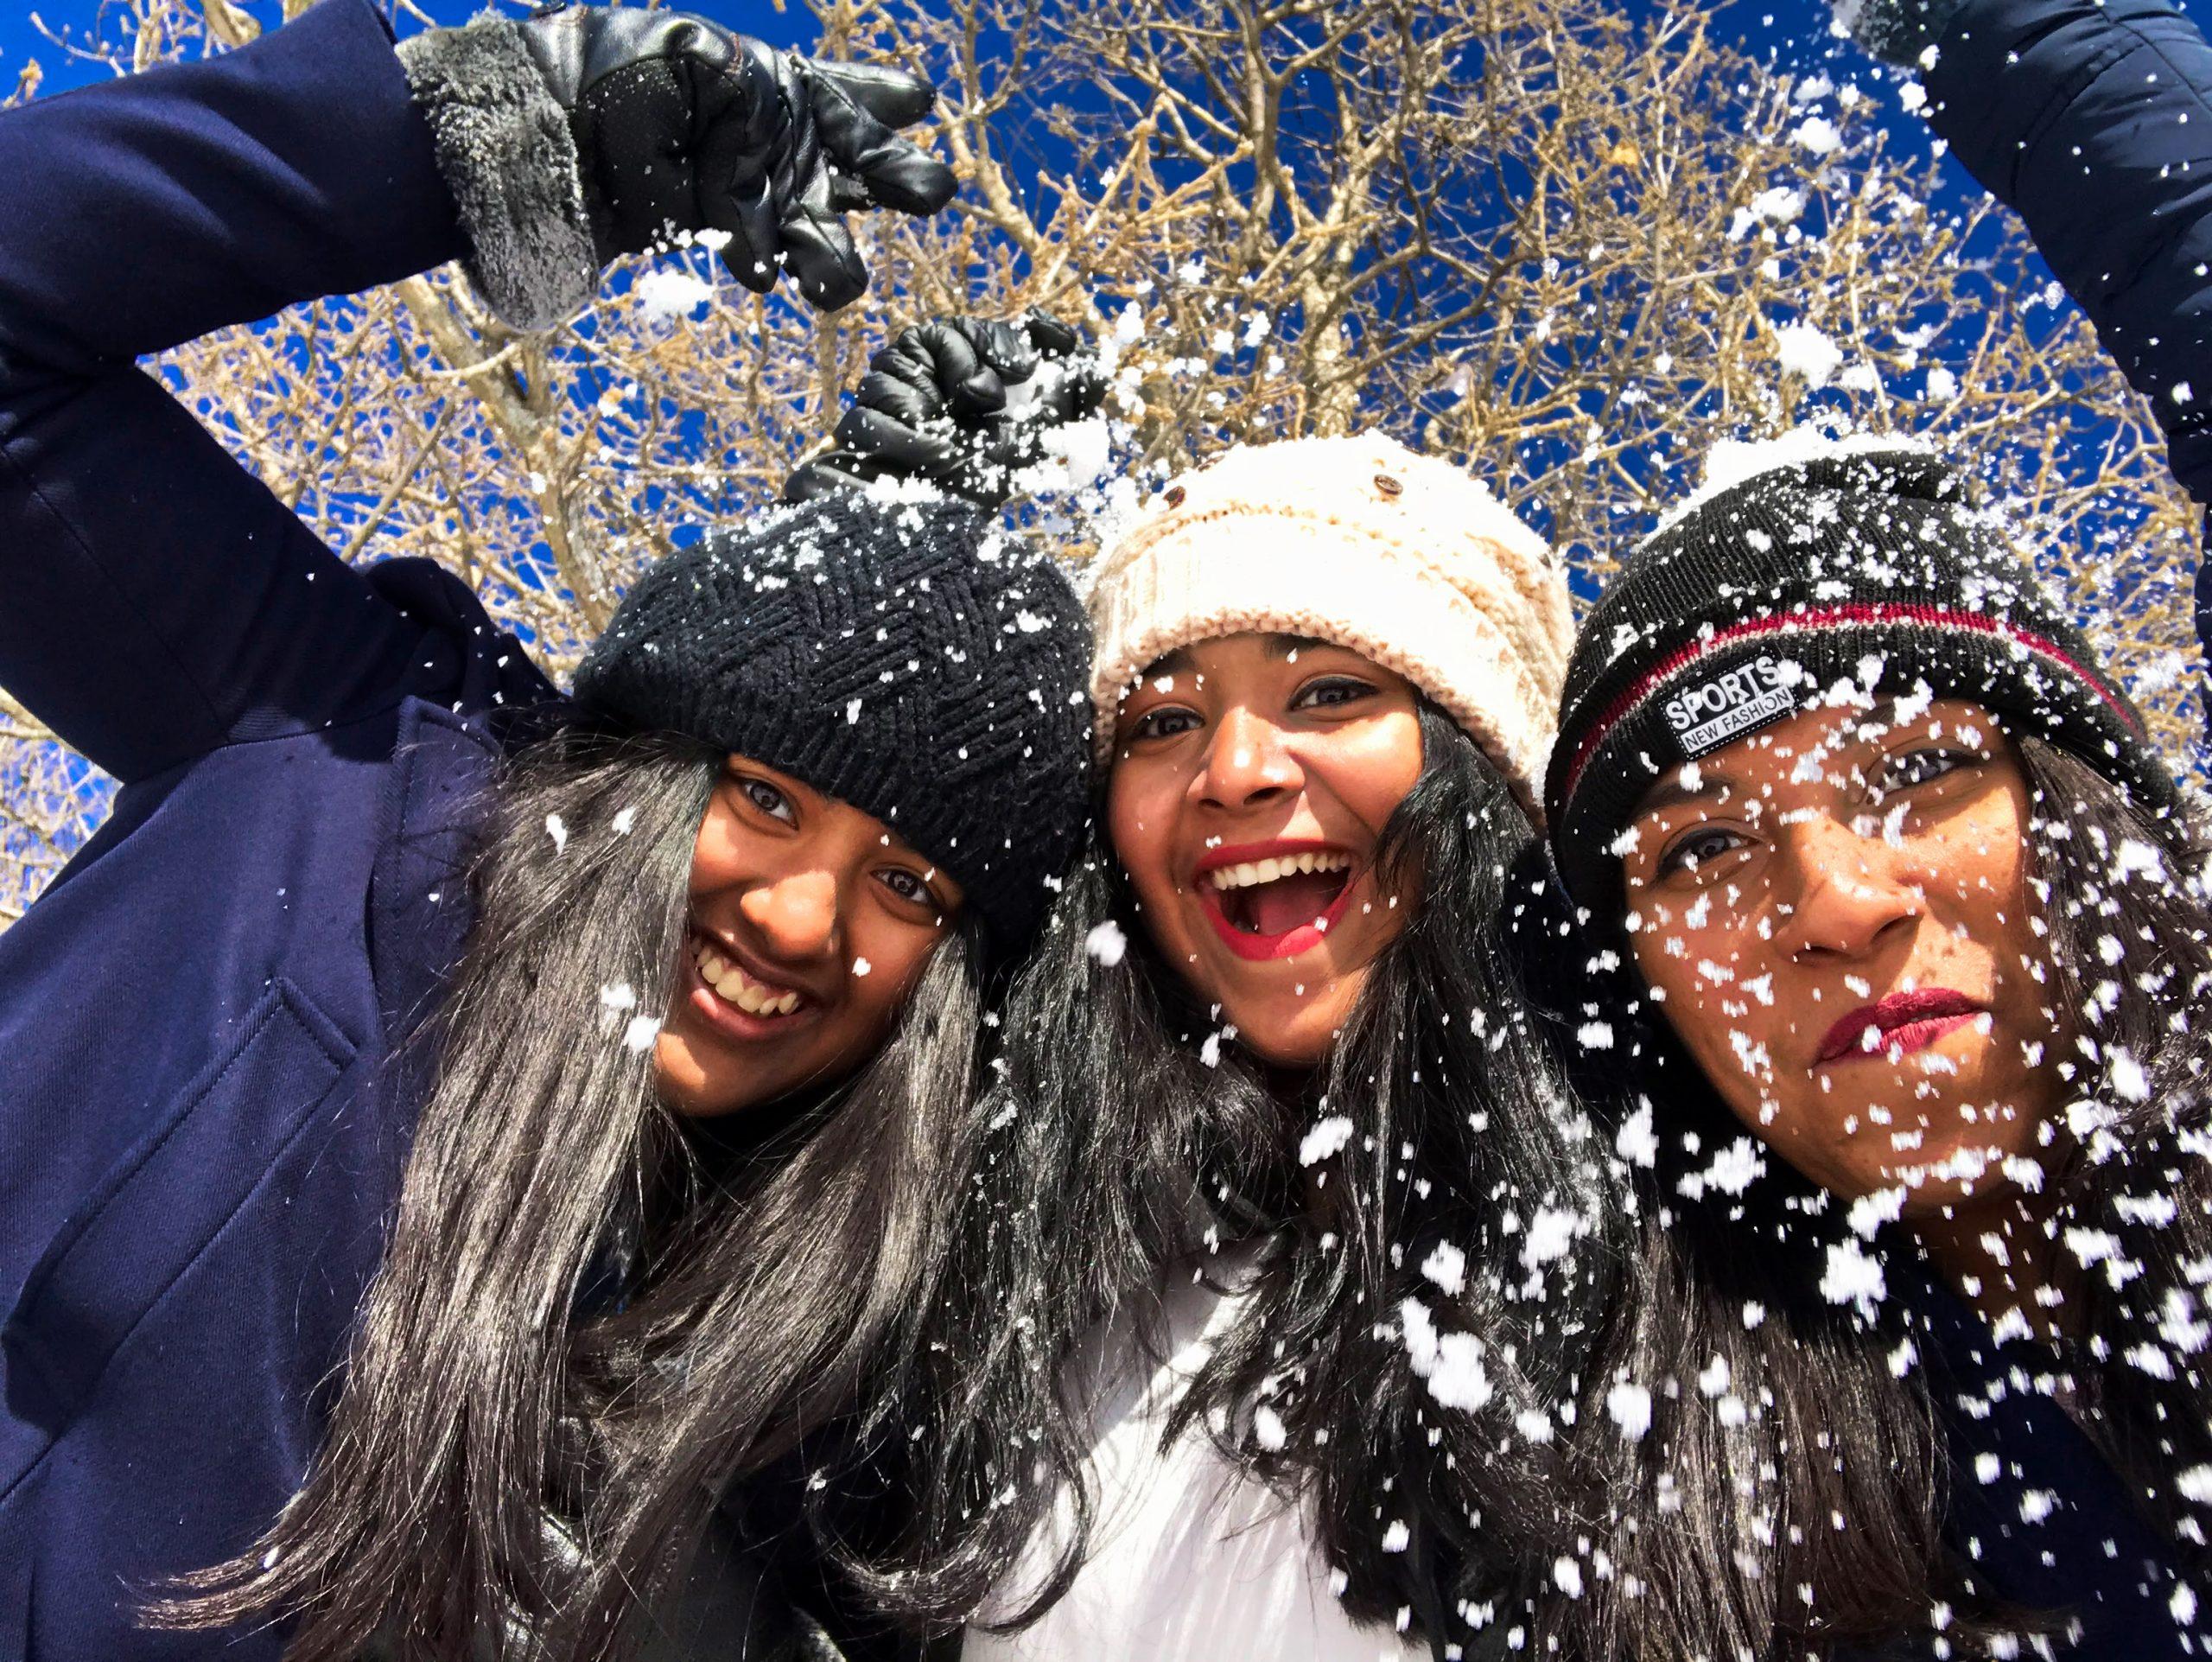 Girls enjoying snow fall